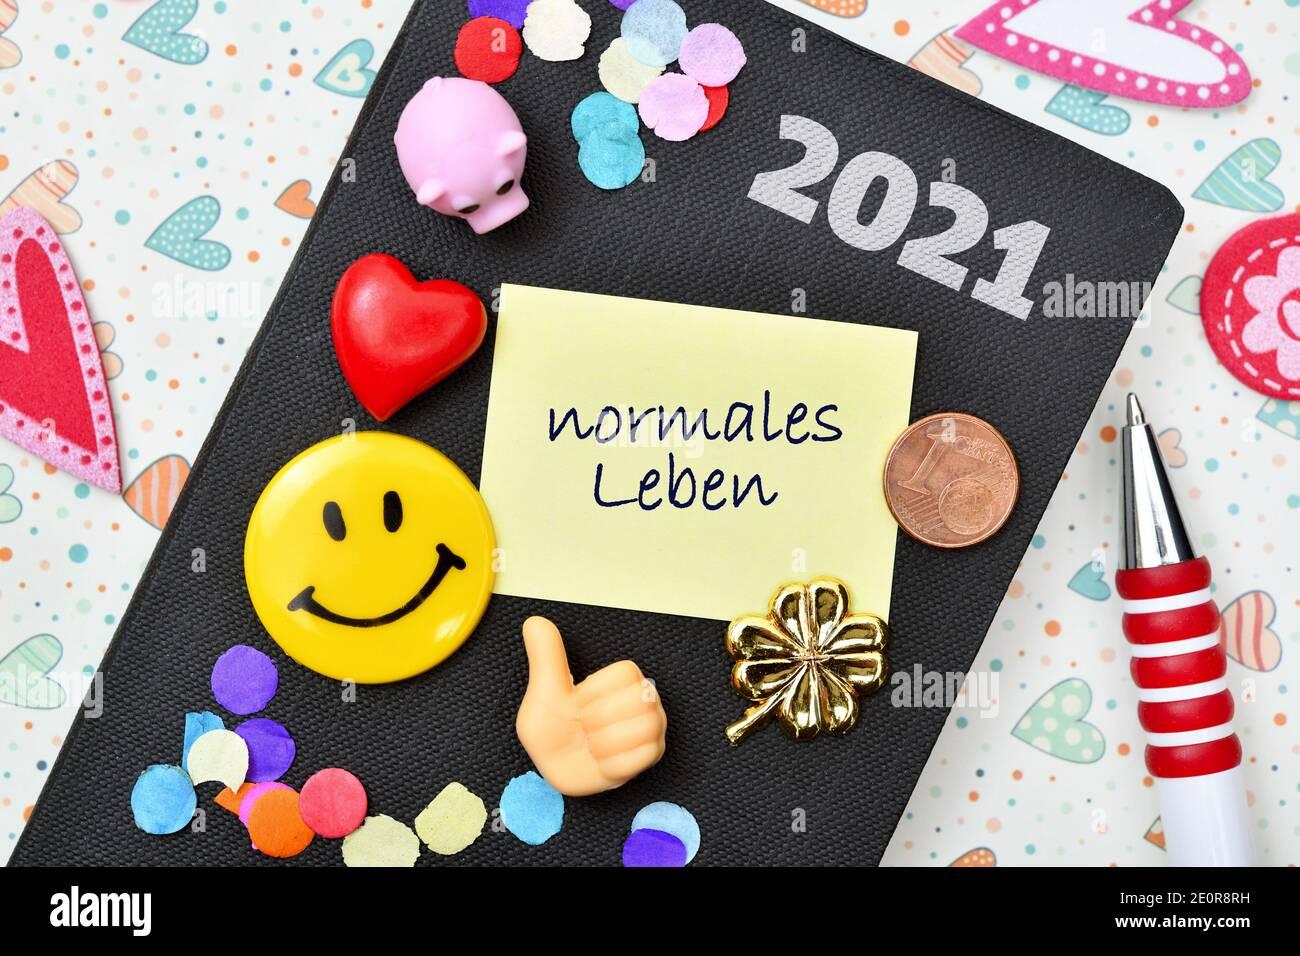 New Years Resolutions, Symbolic Image Stock Photo